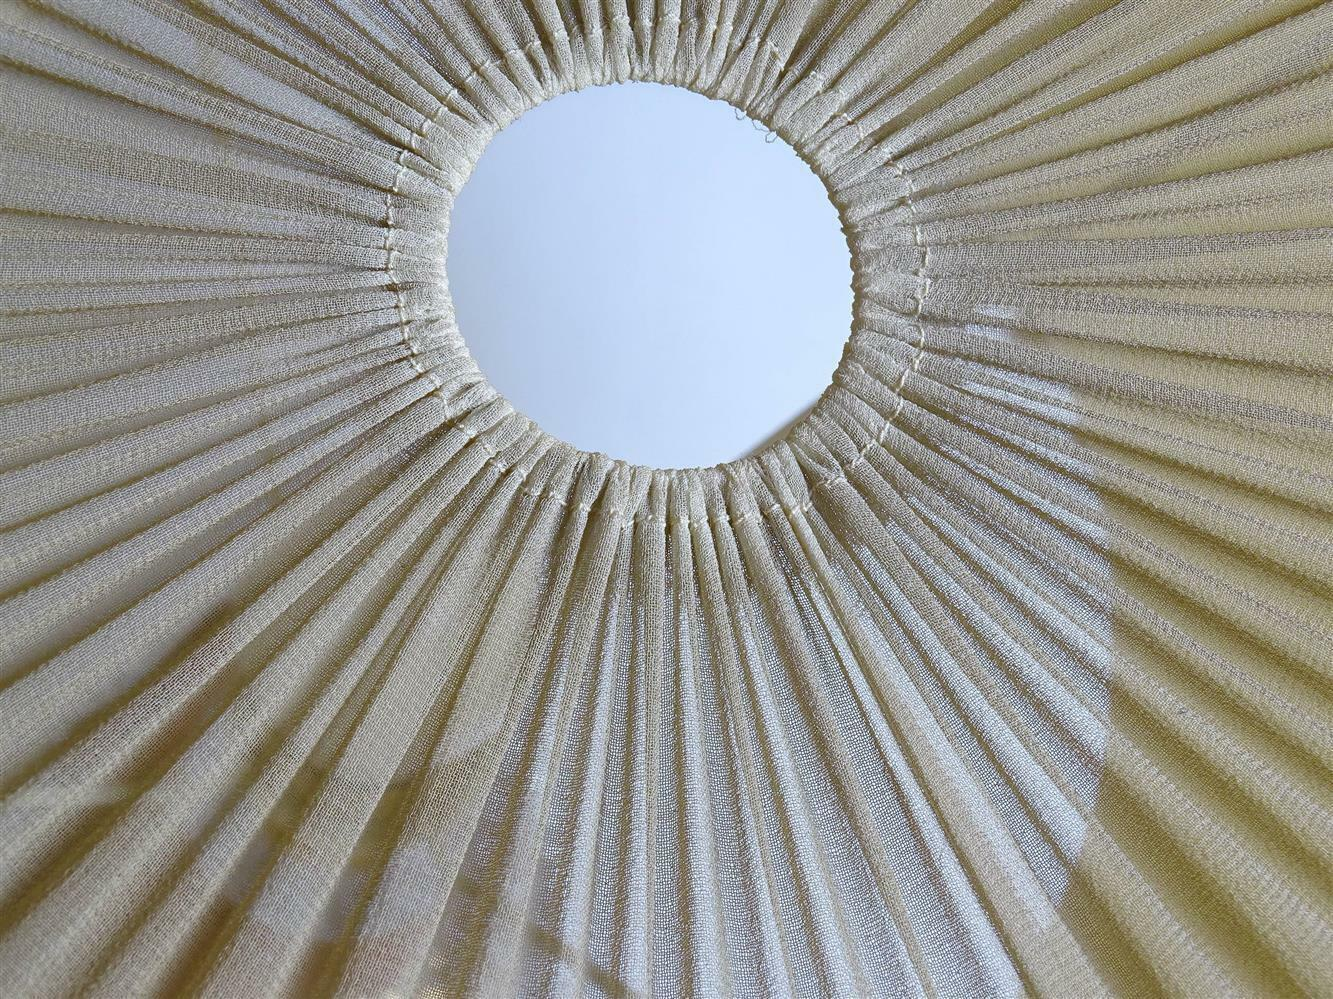 Full Size of Kristall Stehlampe Antike Shabby Chic Glas Korpus Stehlampen Wohnzimmer Schlafzimmer Wohnzimmer Kristall Stehlampe